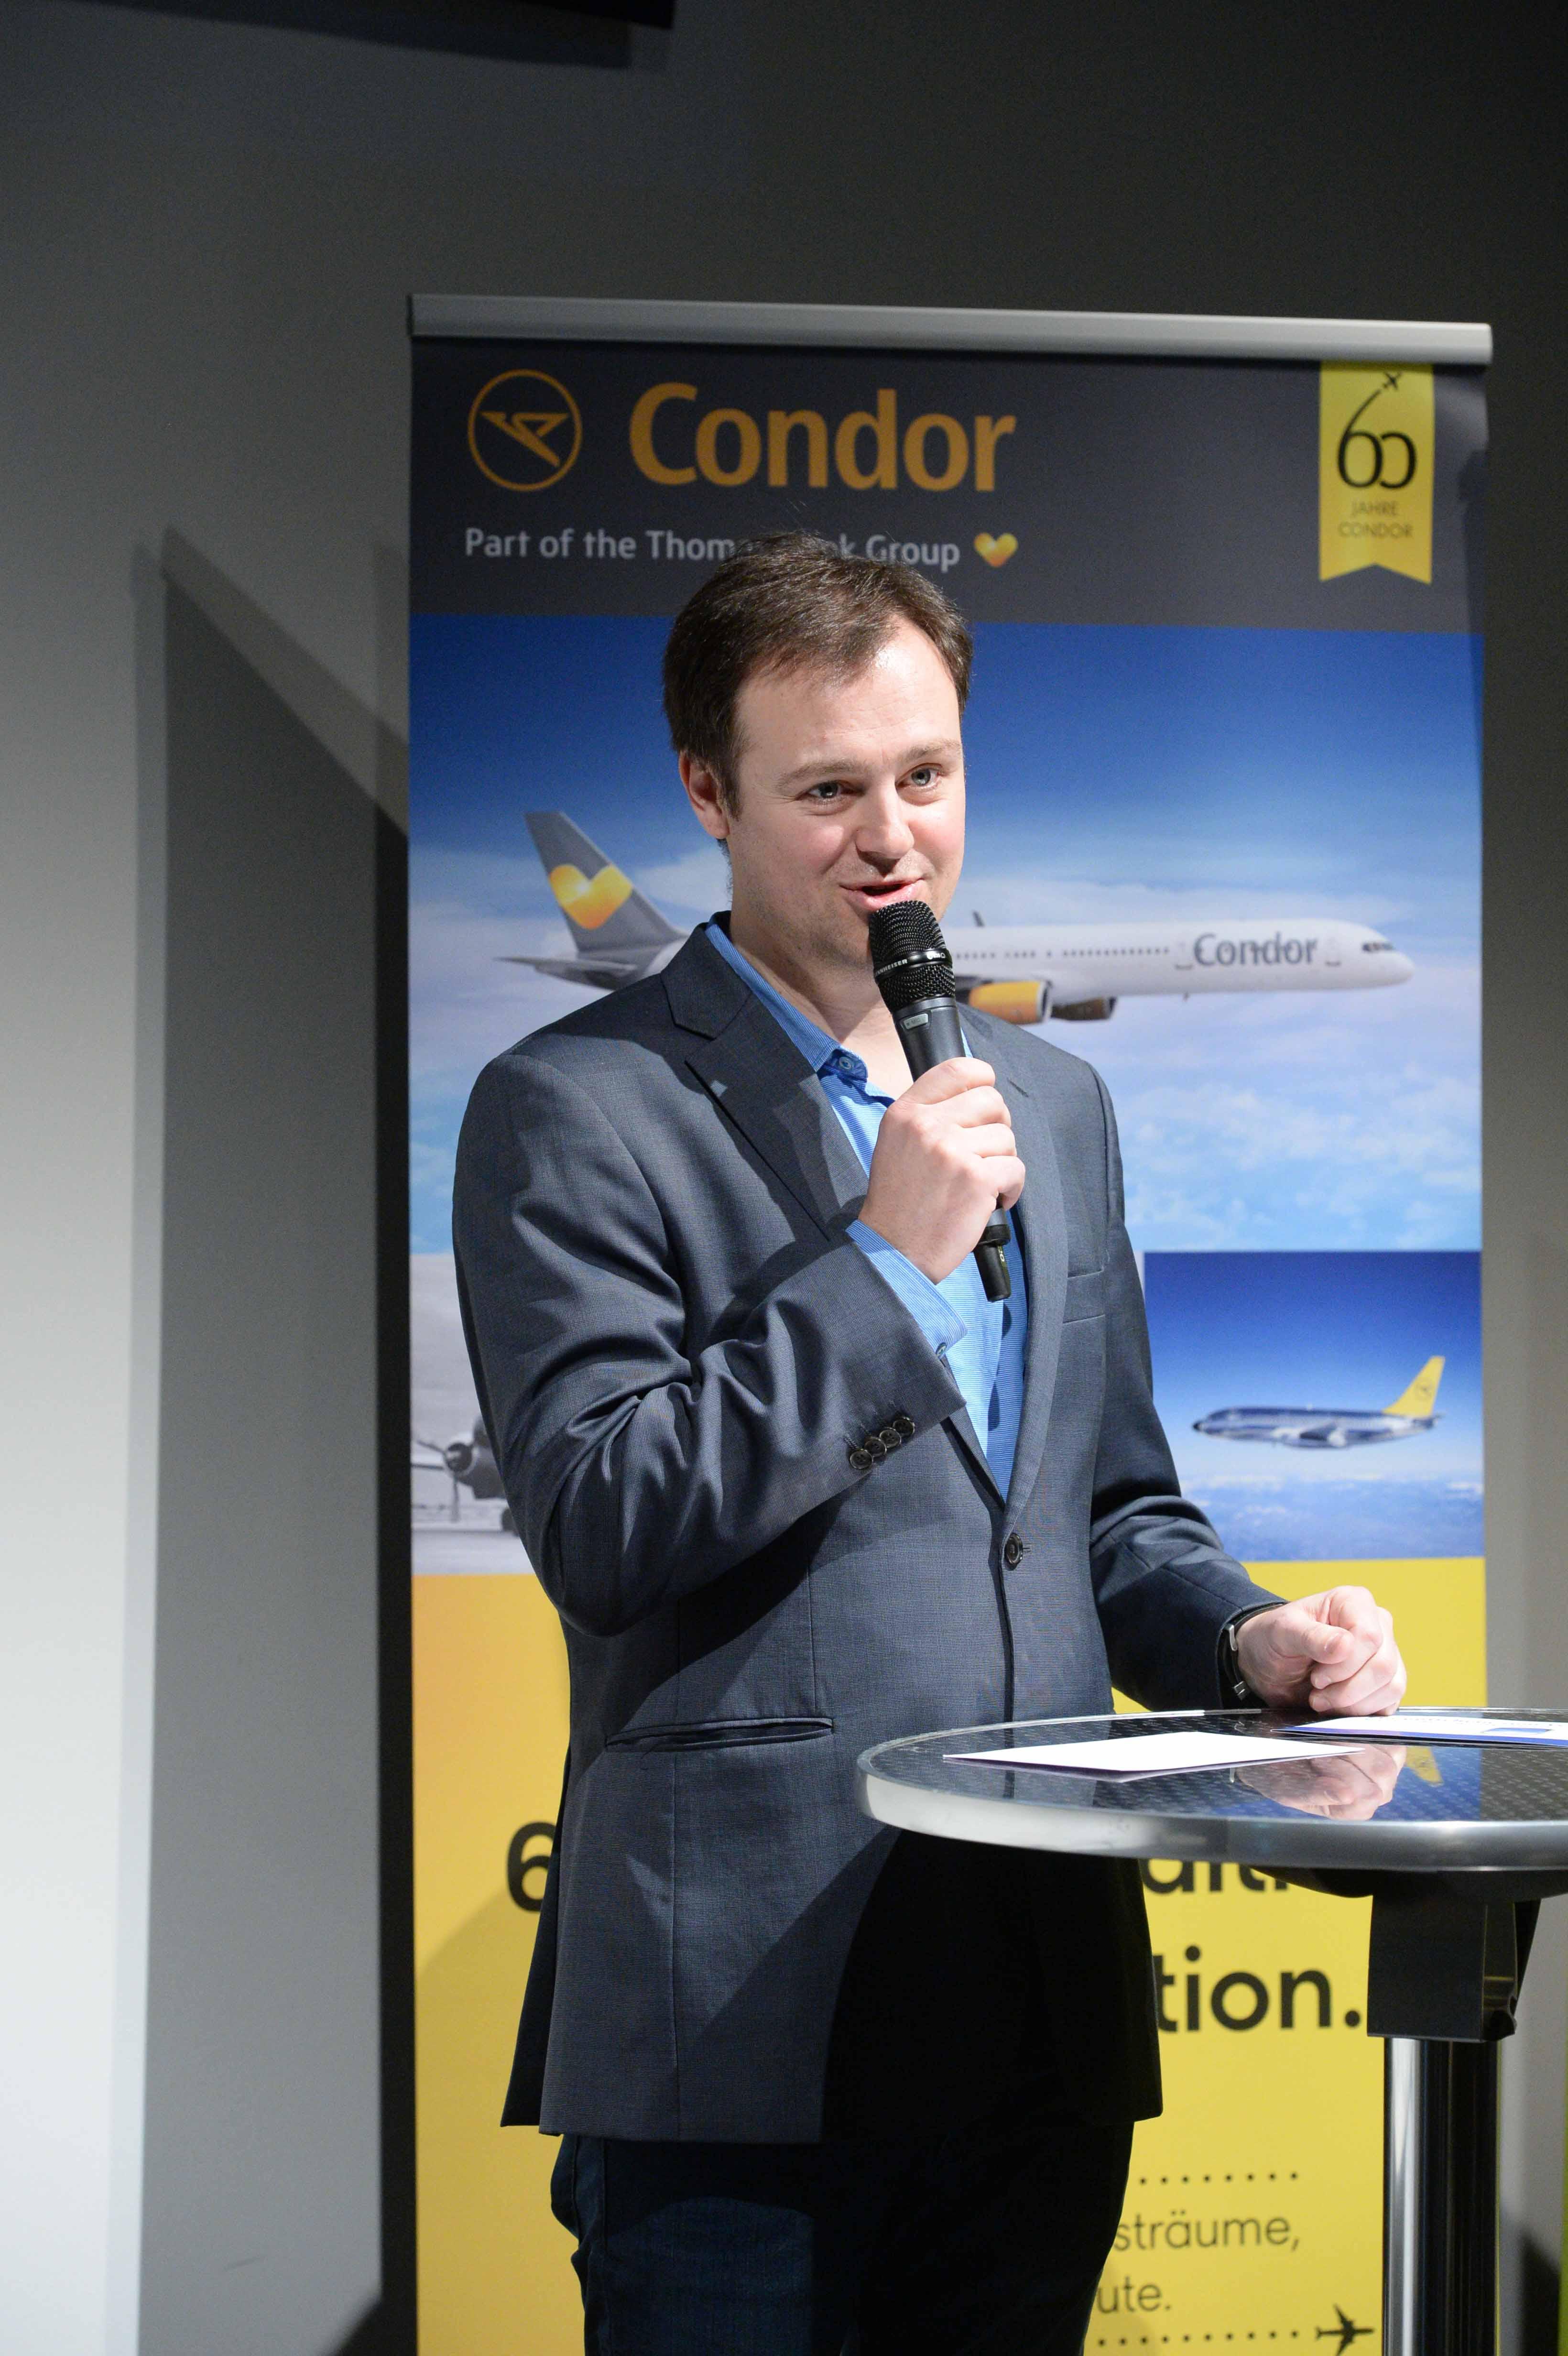 Columbus Autoren Preisverleihung 2015 Christian Leetz Rollup Condor web